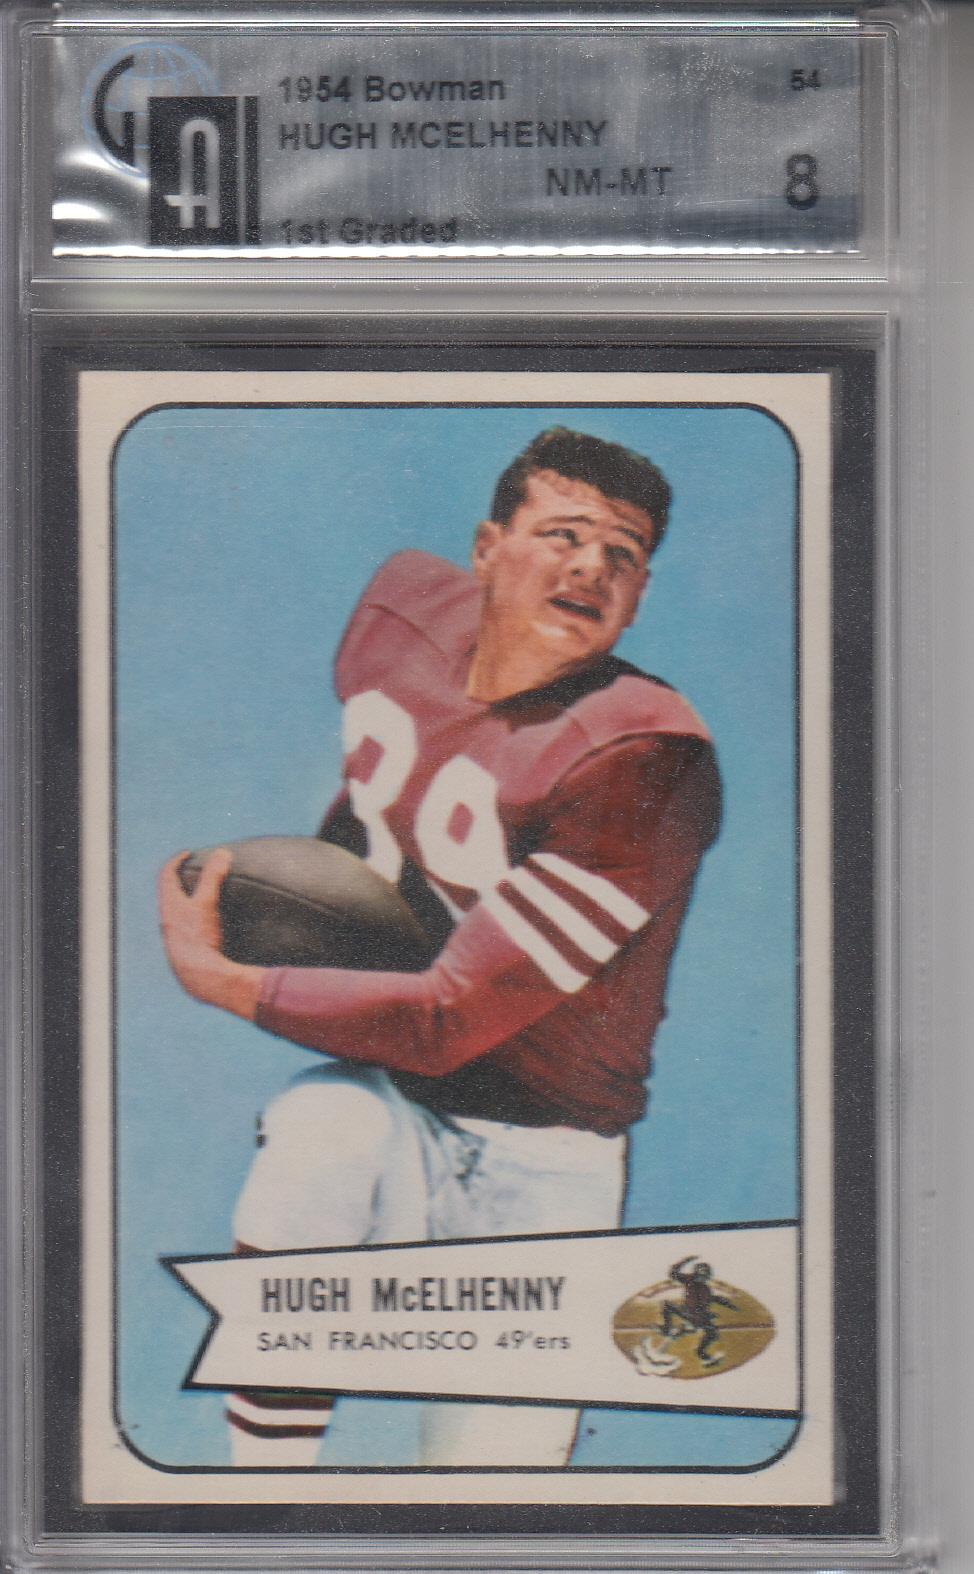 1954 Bowman #54 Hugh McElhenny 49ERS GAI 8 NM-MT Z19828